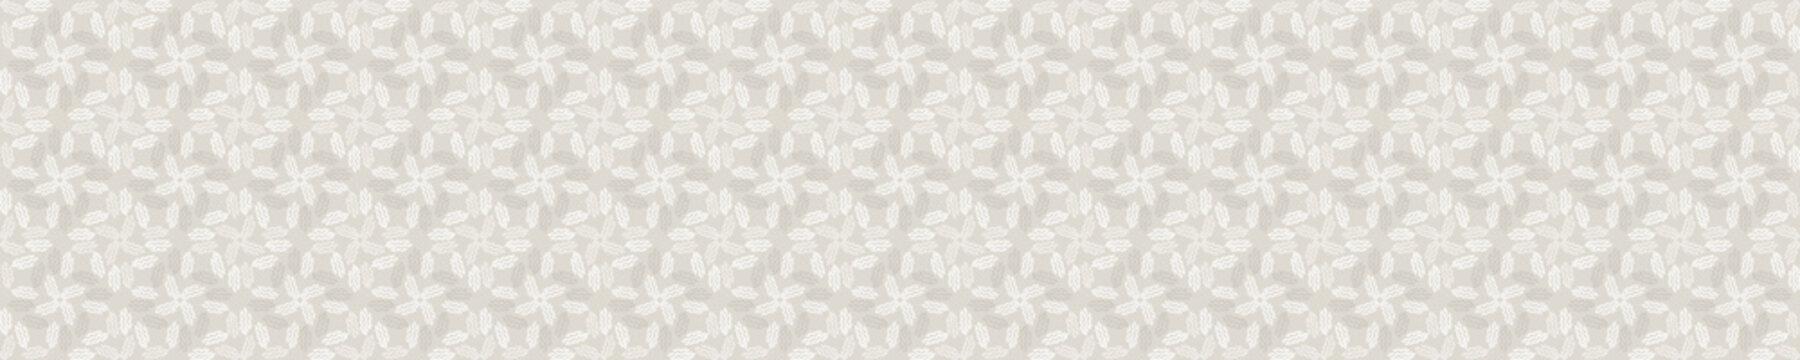 Seamless border damask pattern. Neutral cream flower blooms banner background. Elegant minimal off white beige linen texture.  Stylish ribbon trim